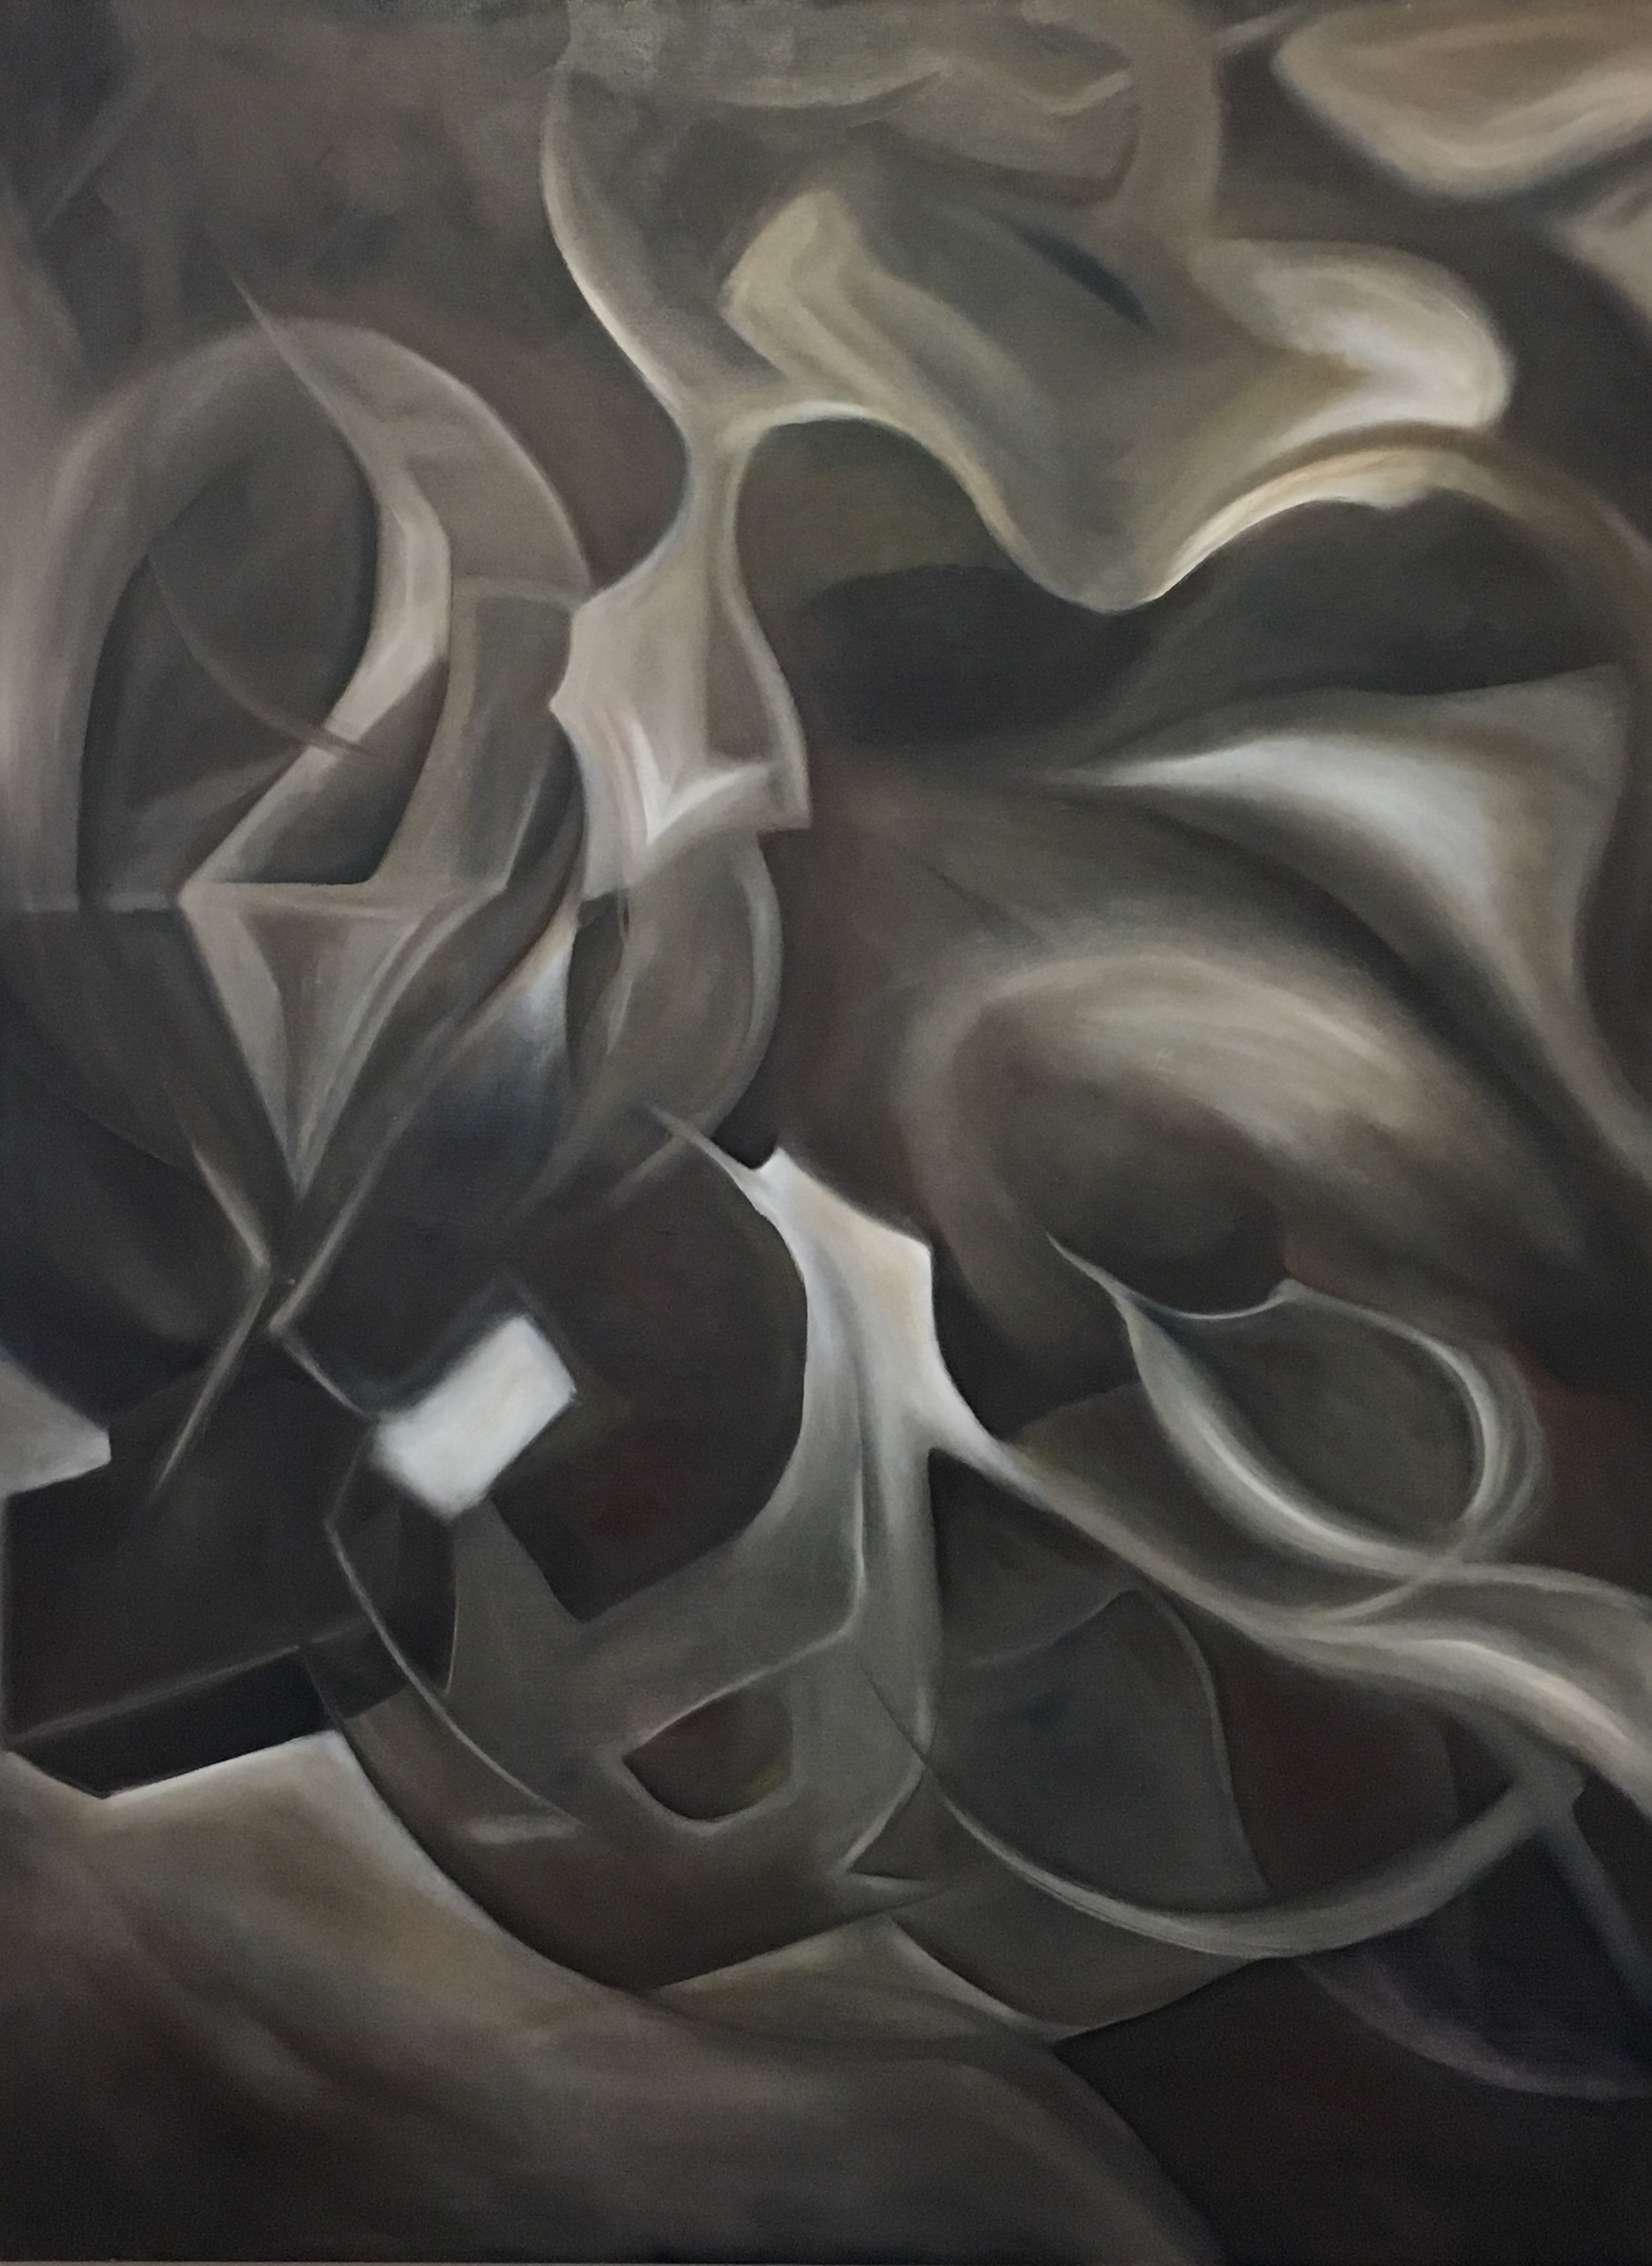 Shadow of Essence. 2018. Oil on Canvas. 3x4 feet